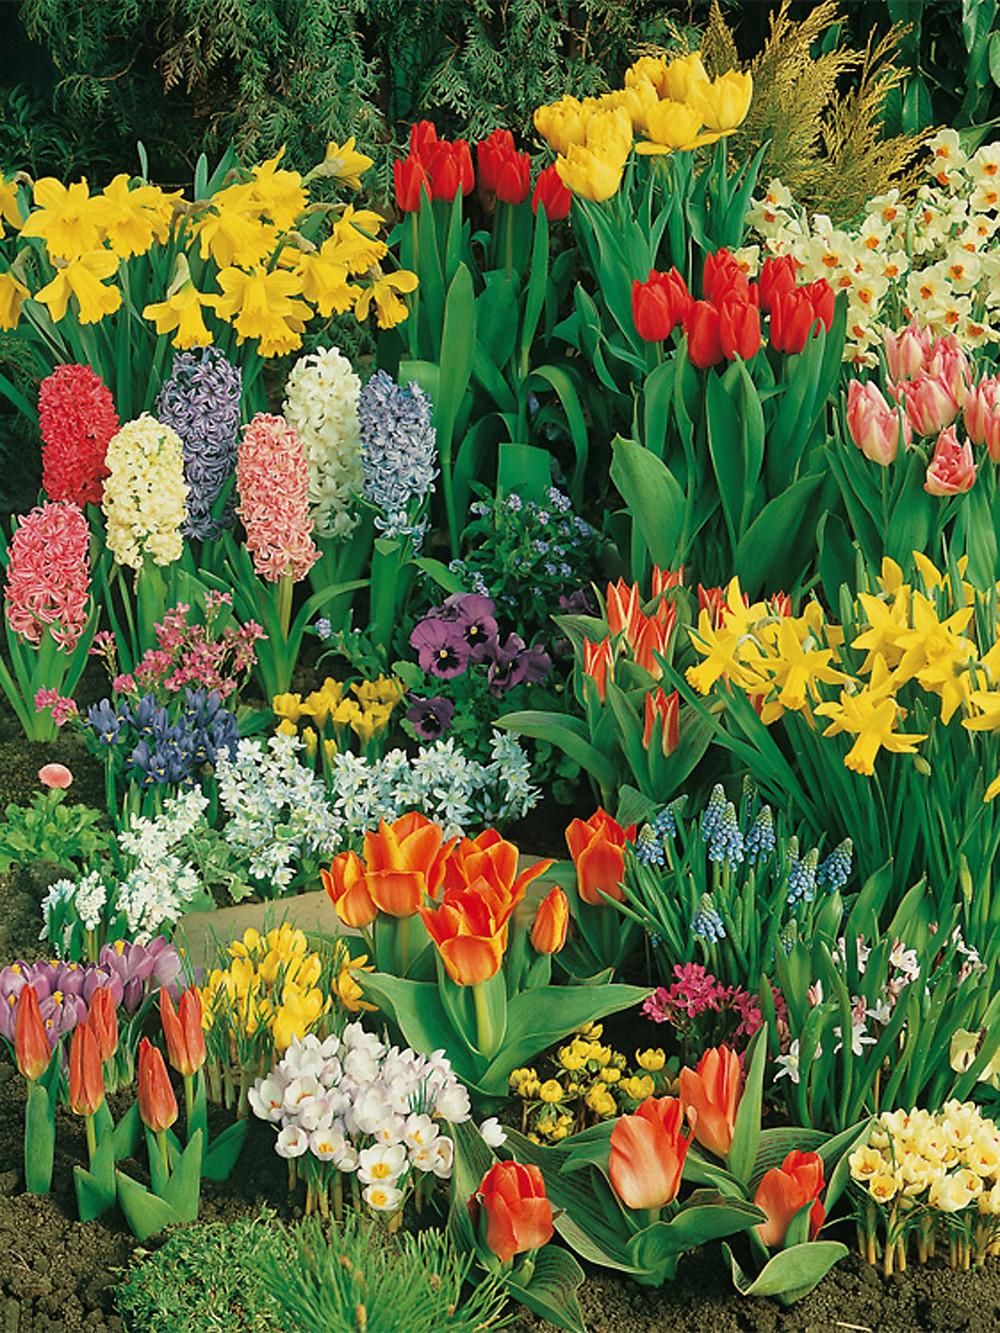 Blumenzwiebel, Frühlingszwiebel